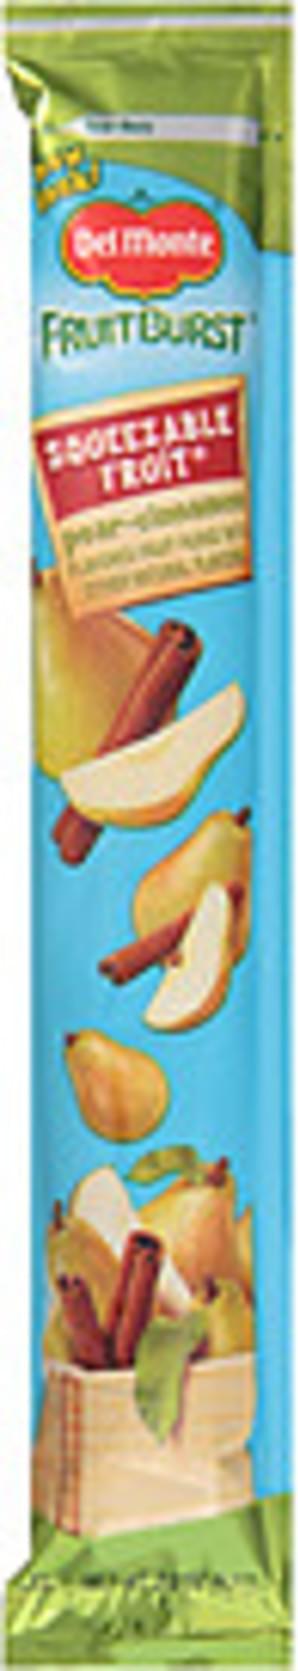 Del Monte Pear-Cinnamon Squeezable Fruit - 2.2 oz